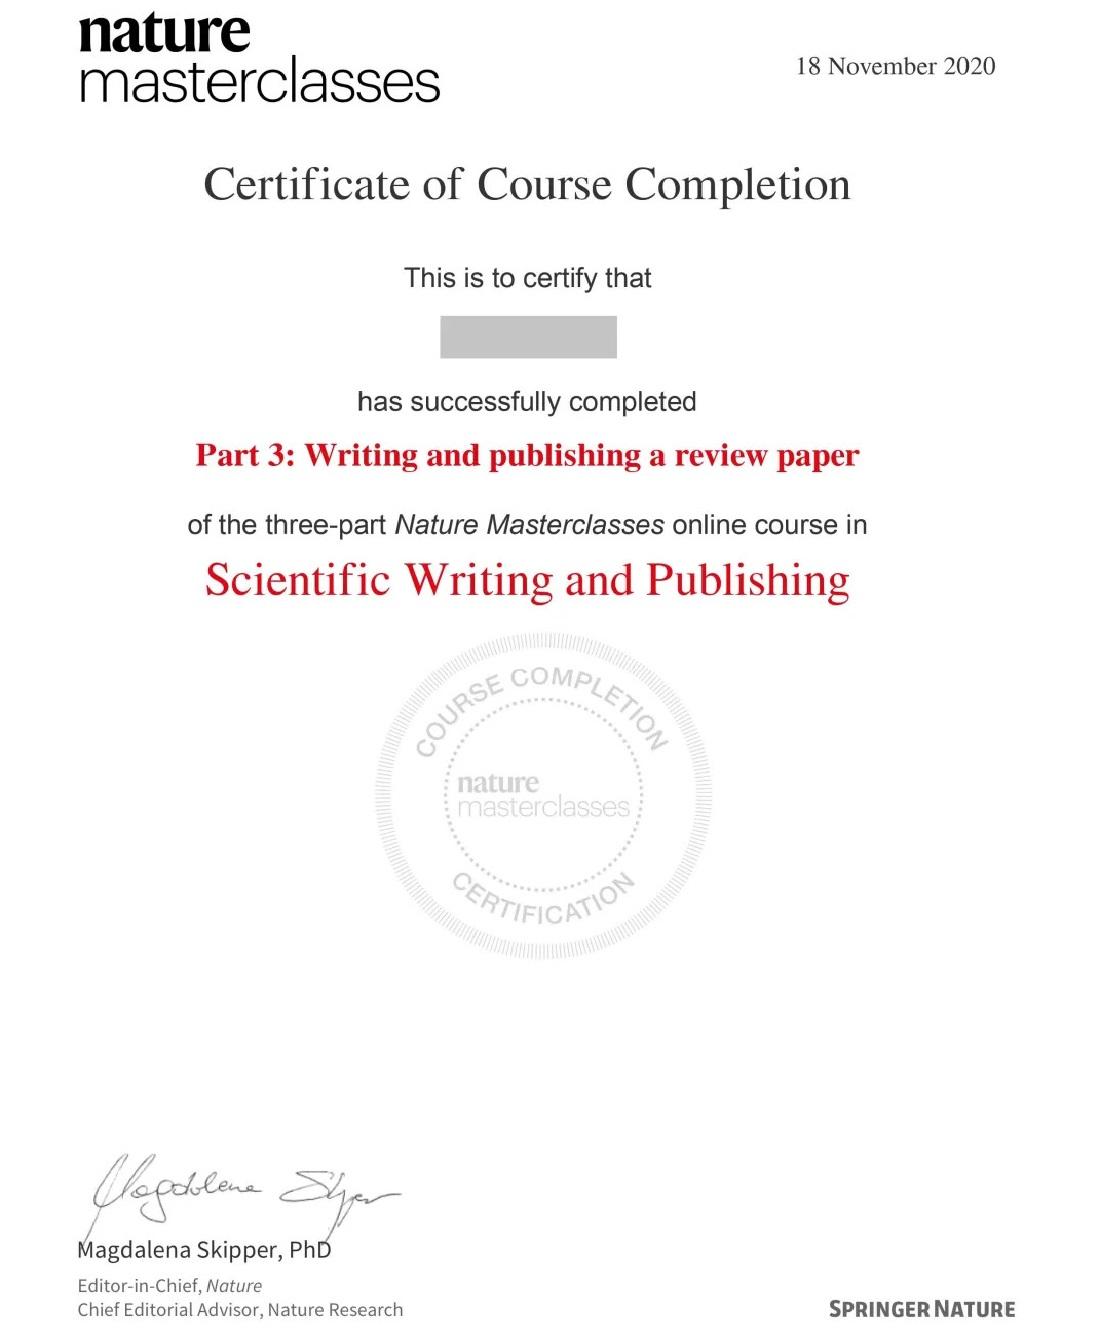 certificate--cropped.jpg